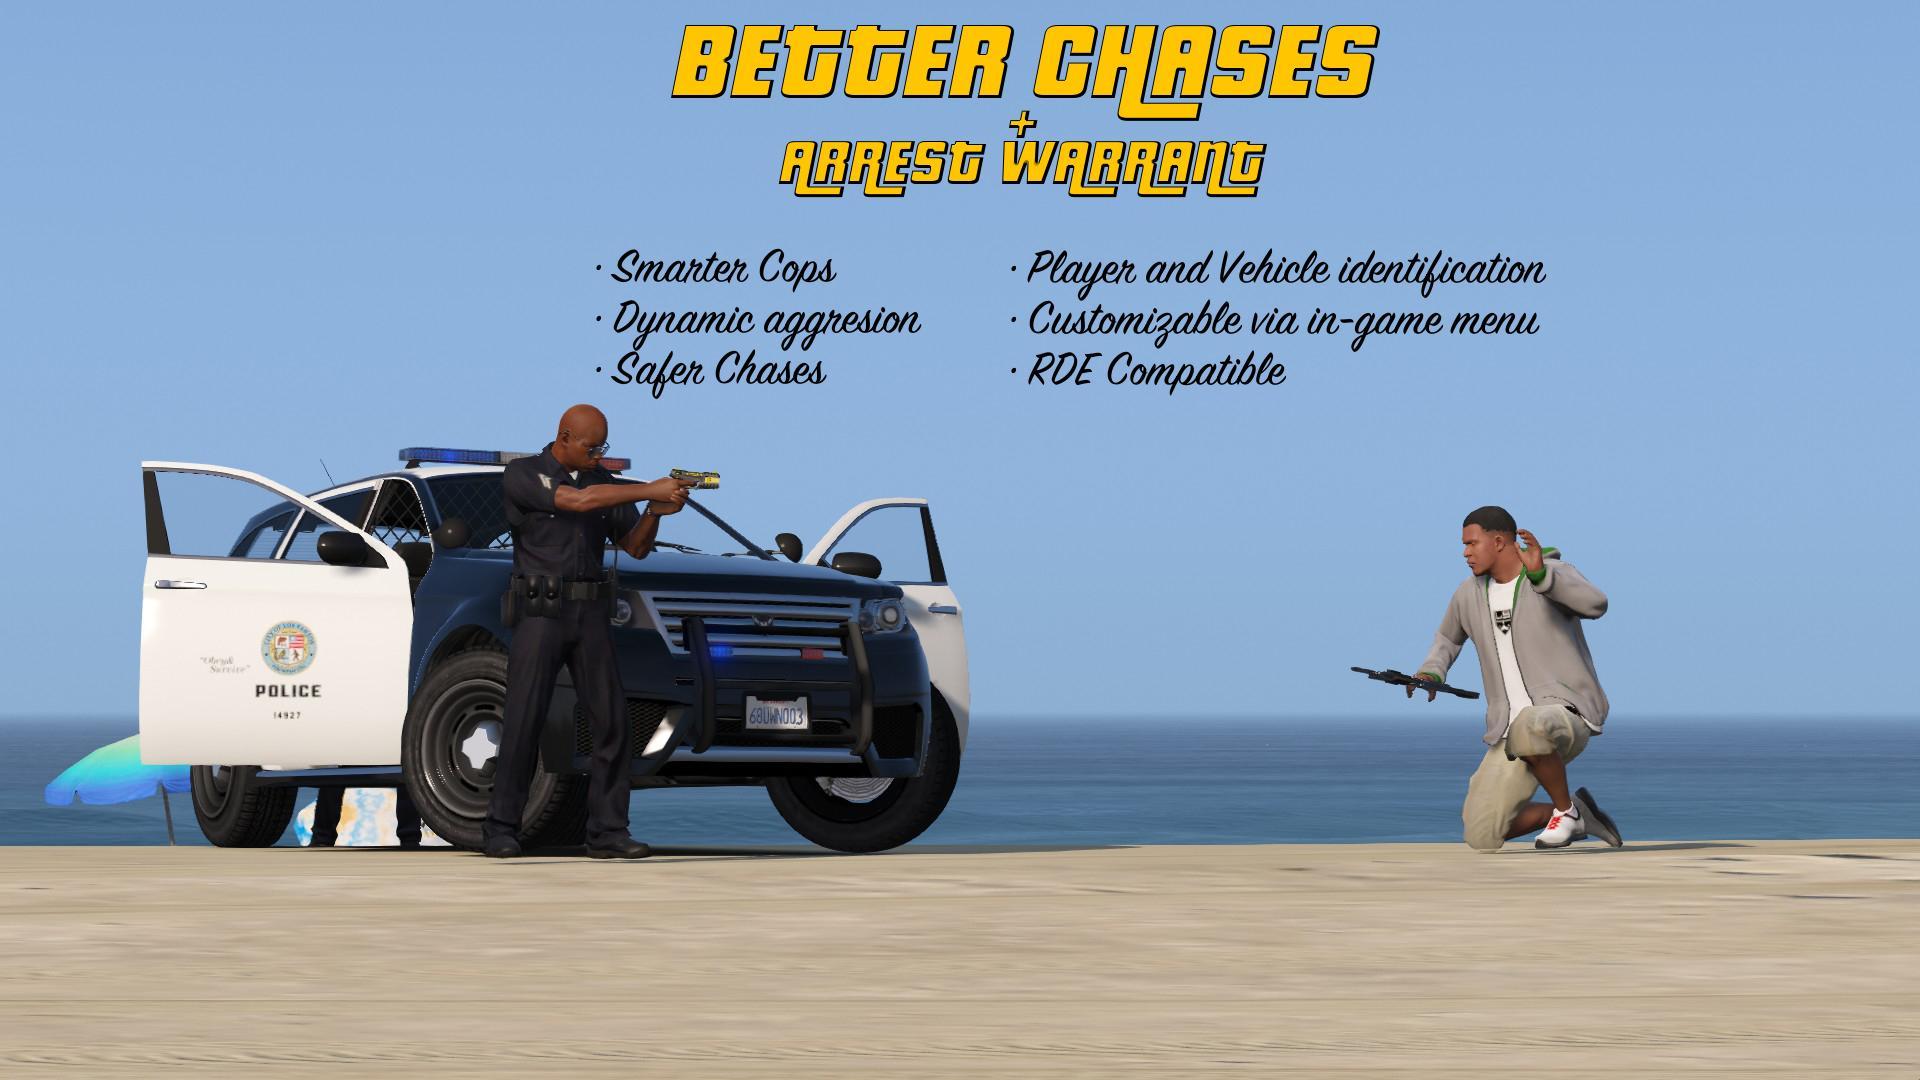 Better Chases + Arrest Warrant - GTA5-Mods com